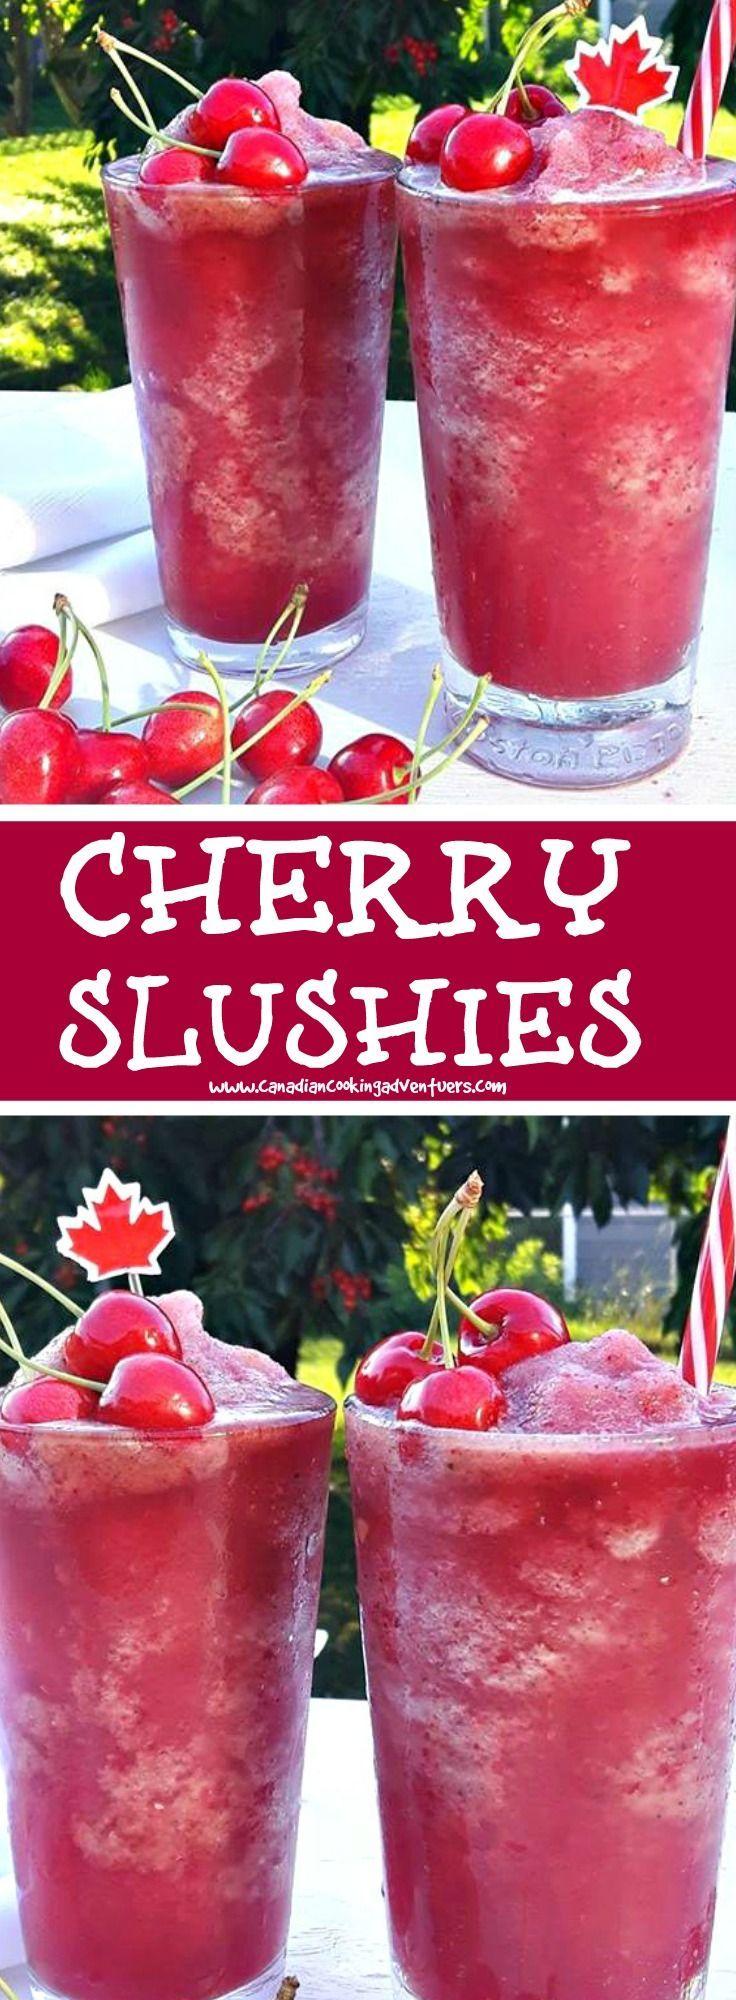 Cherry Slushies Slushies Slushie Recipe Recipes